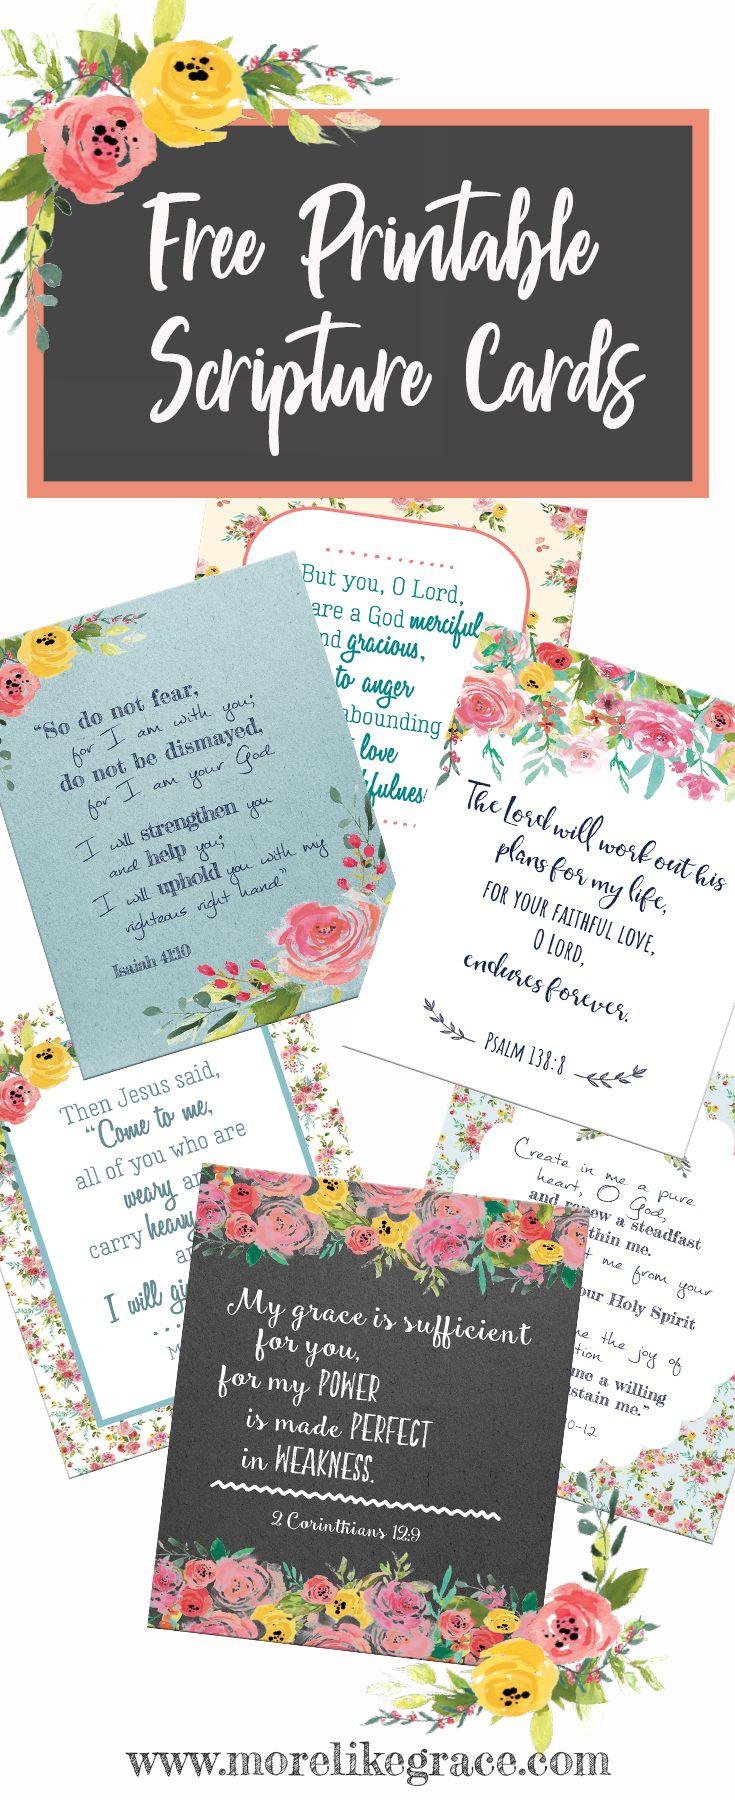 Free Printable Scripture Cards Greetings Pinterest Free